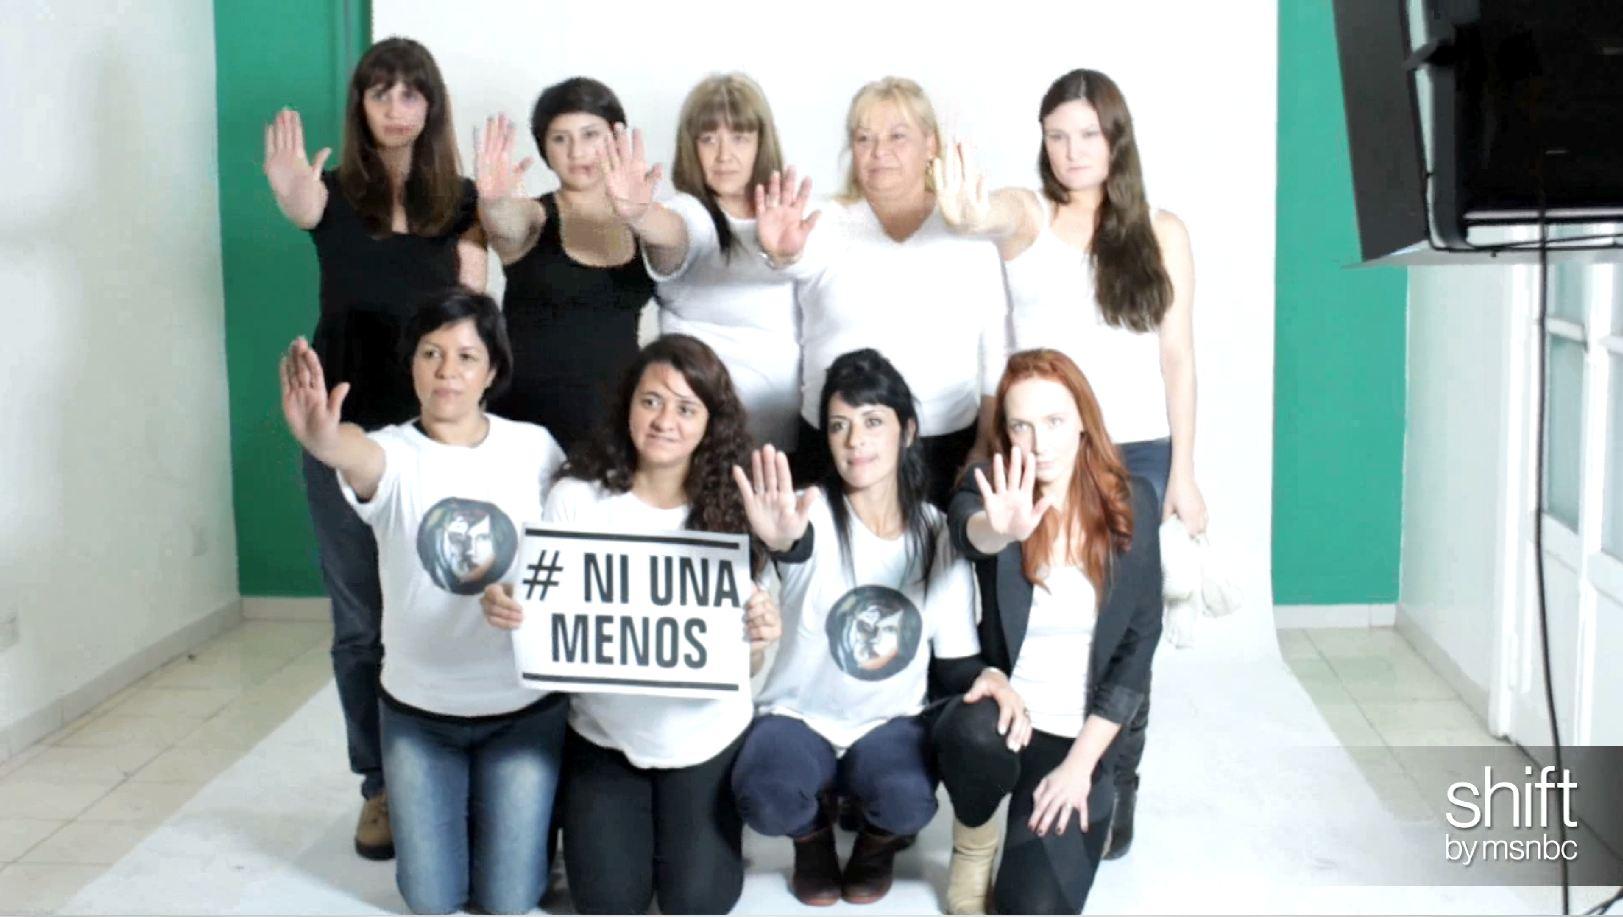 Argentina's femicide problem